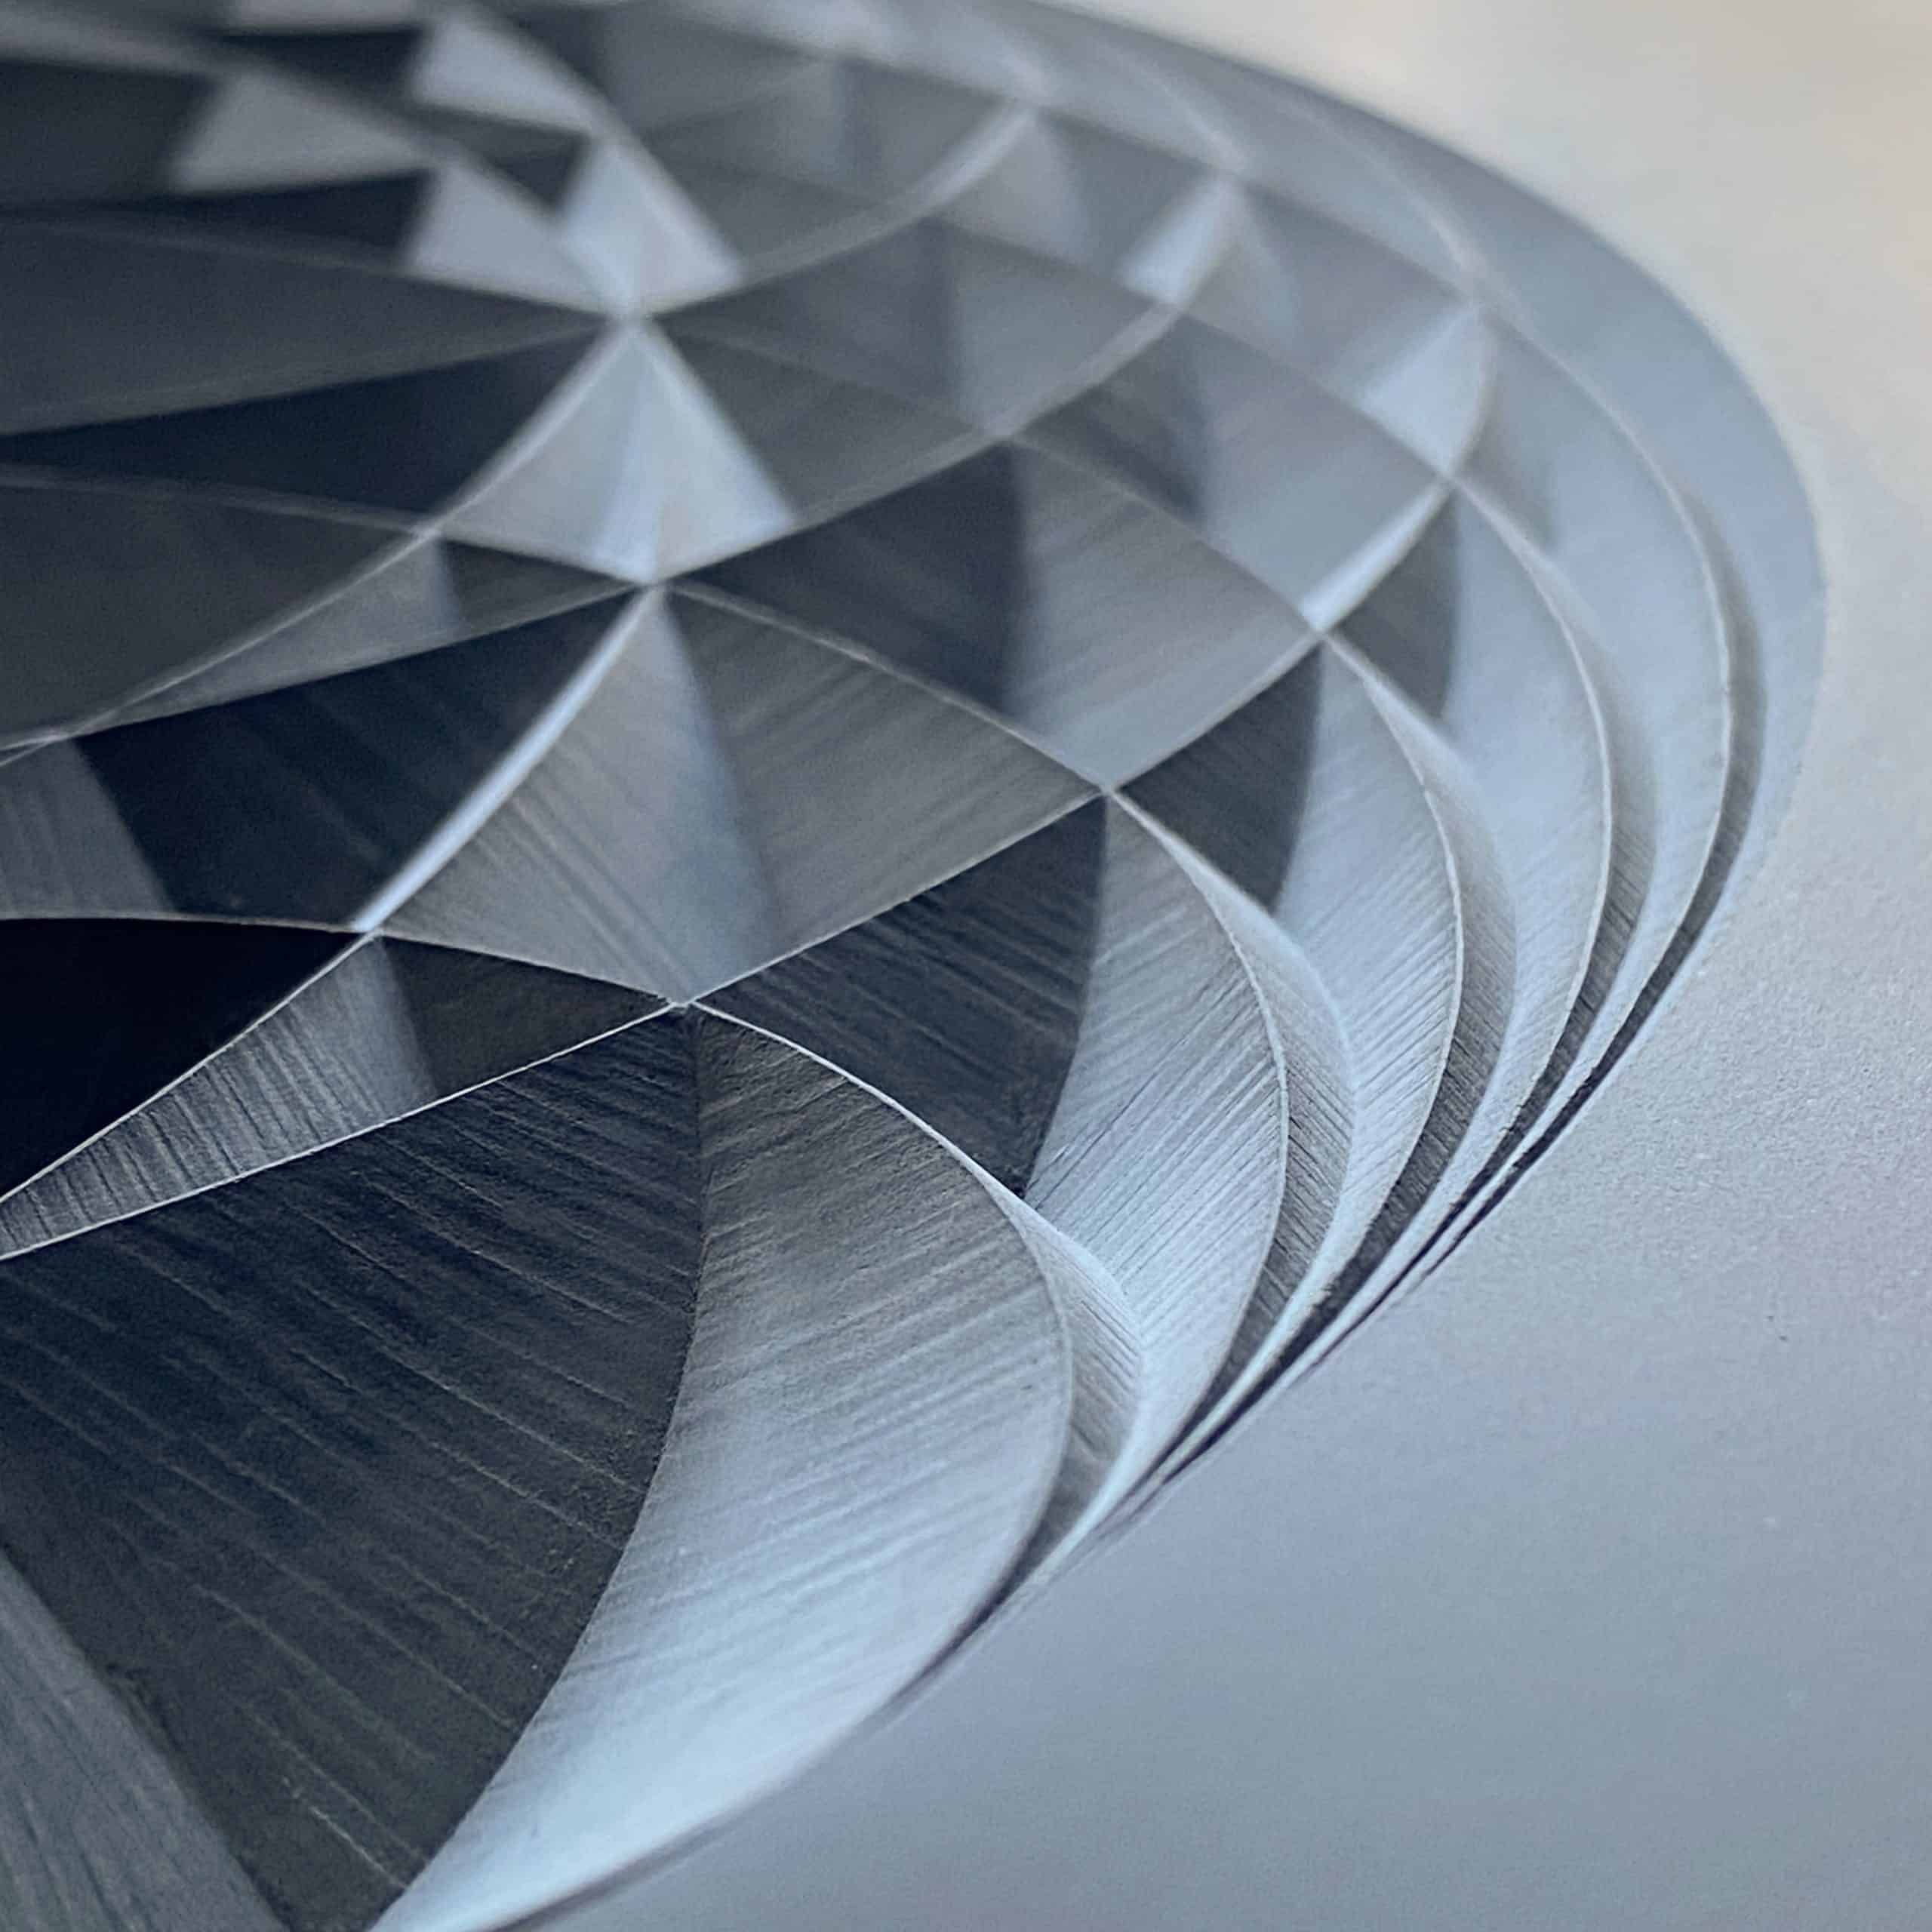 geometric pattern drawn on paper